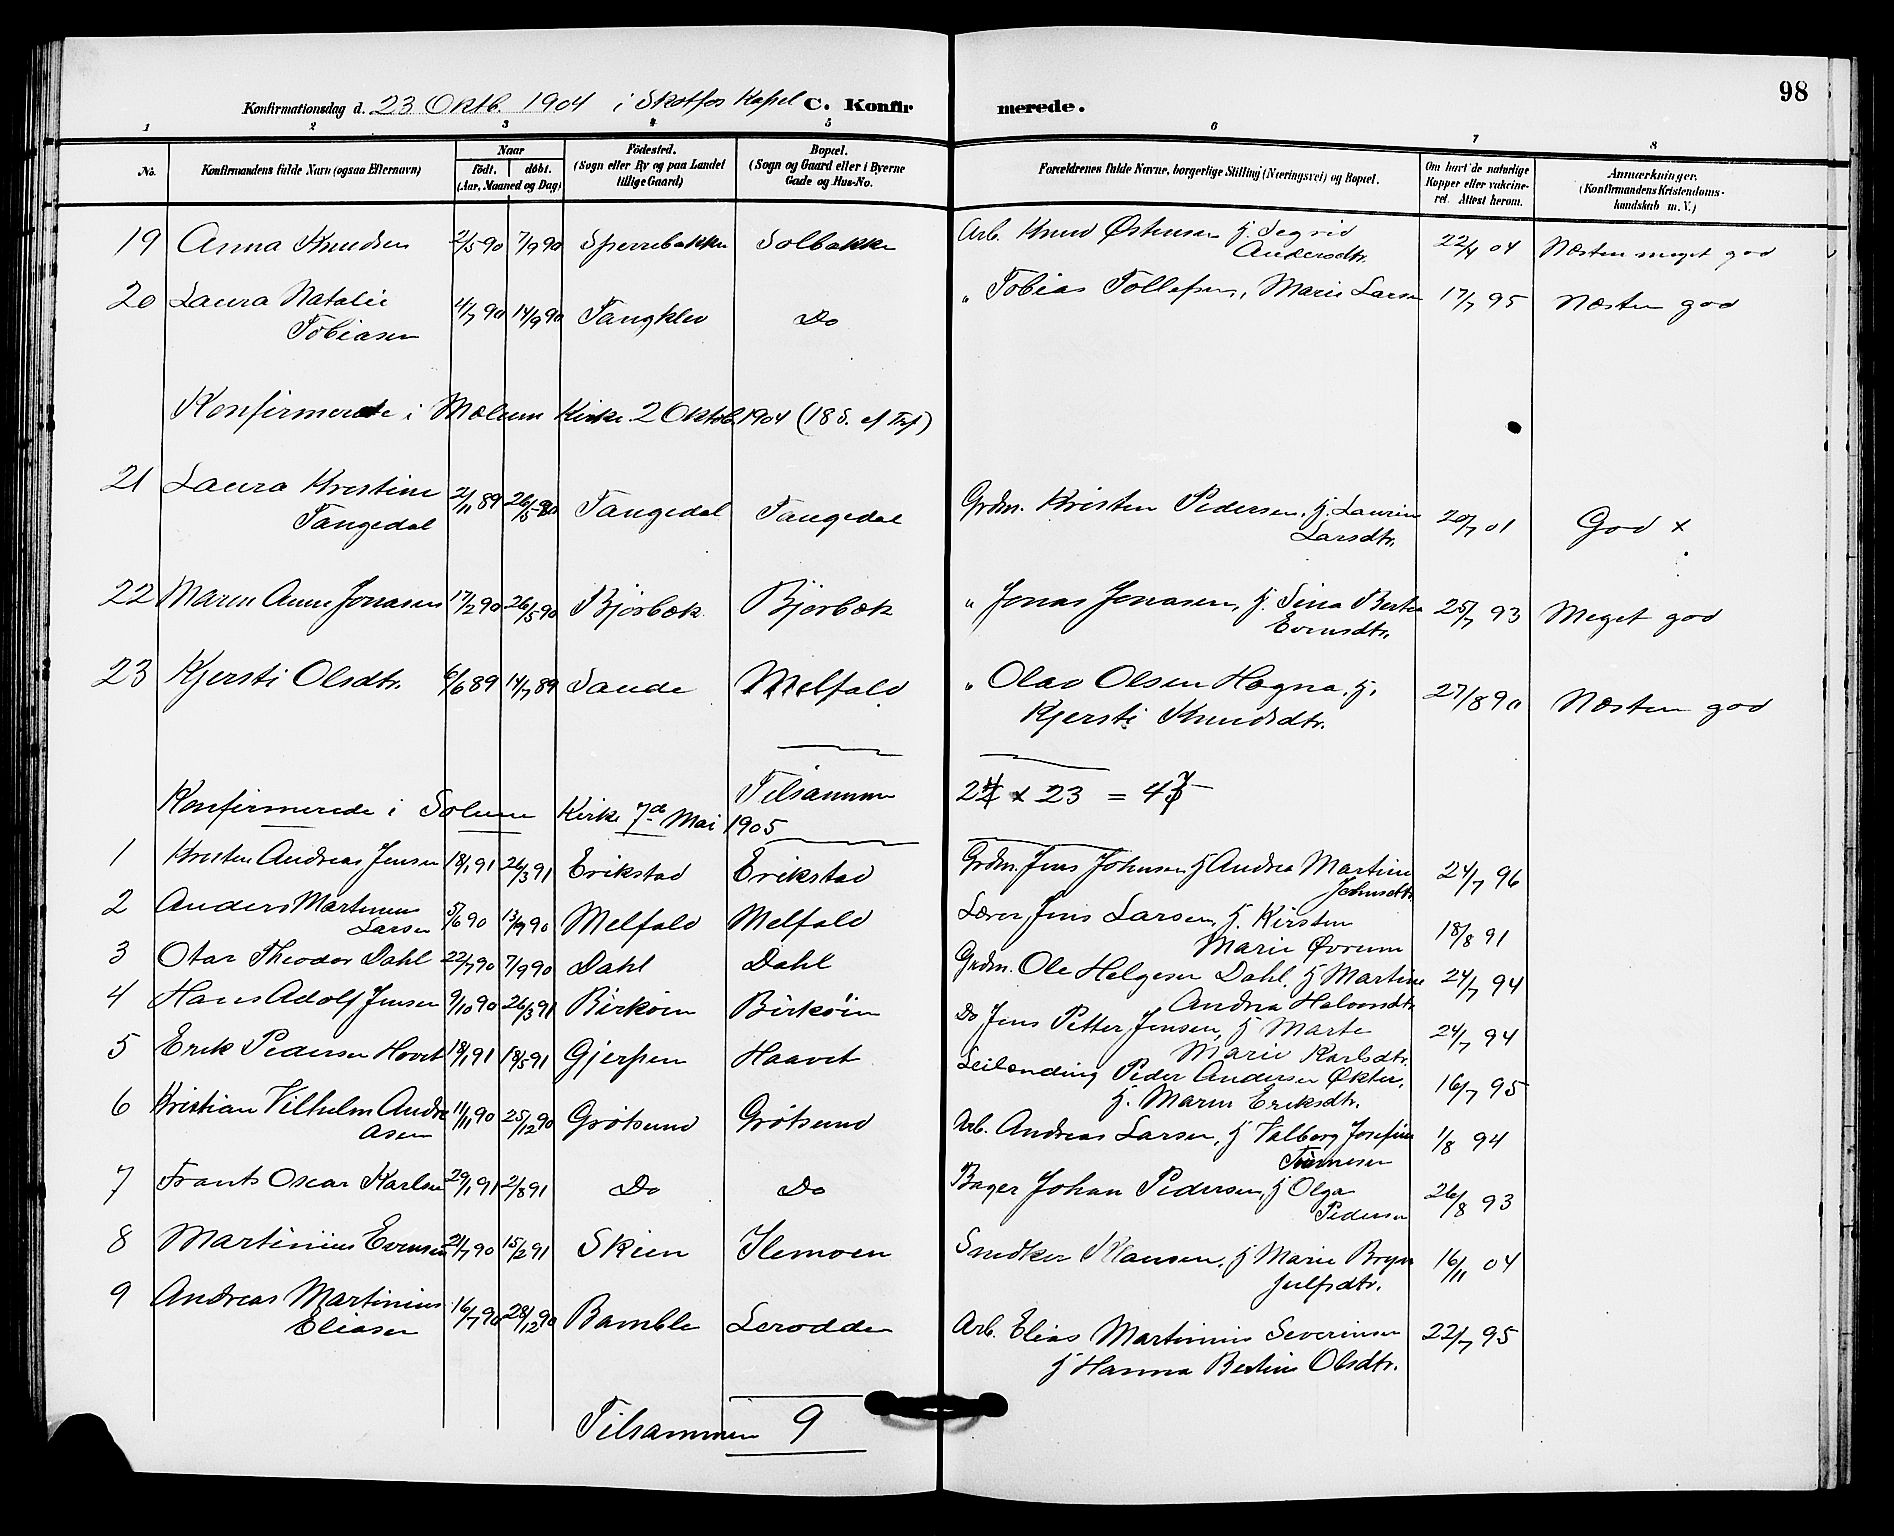 SAKO, Solum kirkebøker, G/Gb/L0004: Klokkerbok nr. II 4, 1898-1905, s. 98